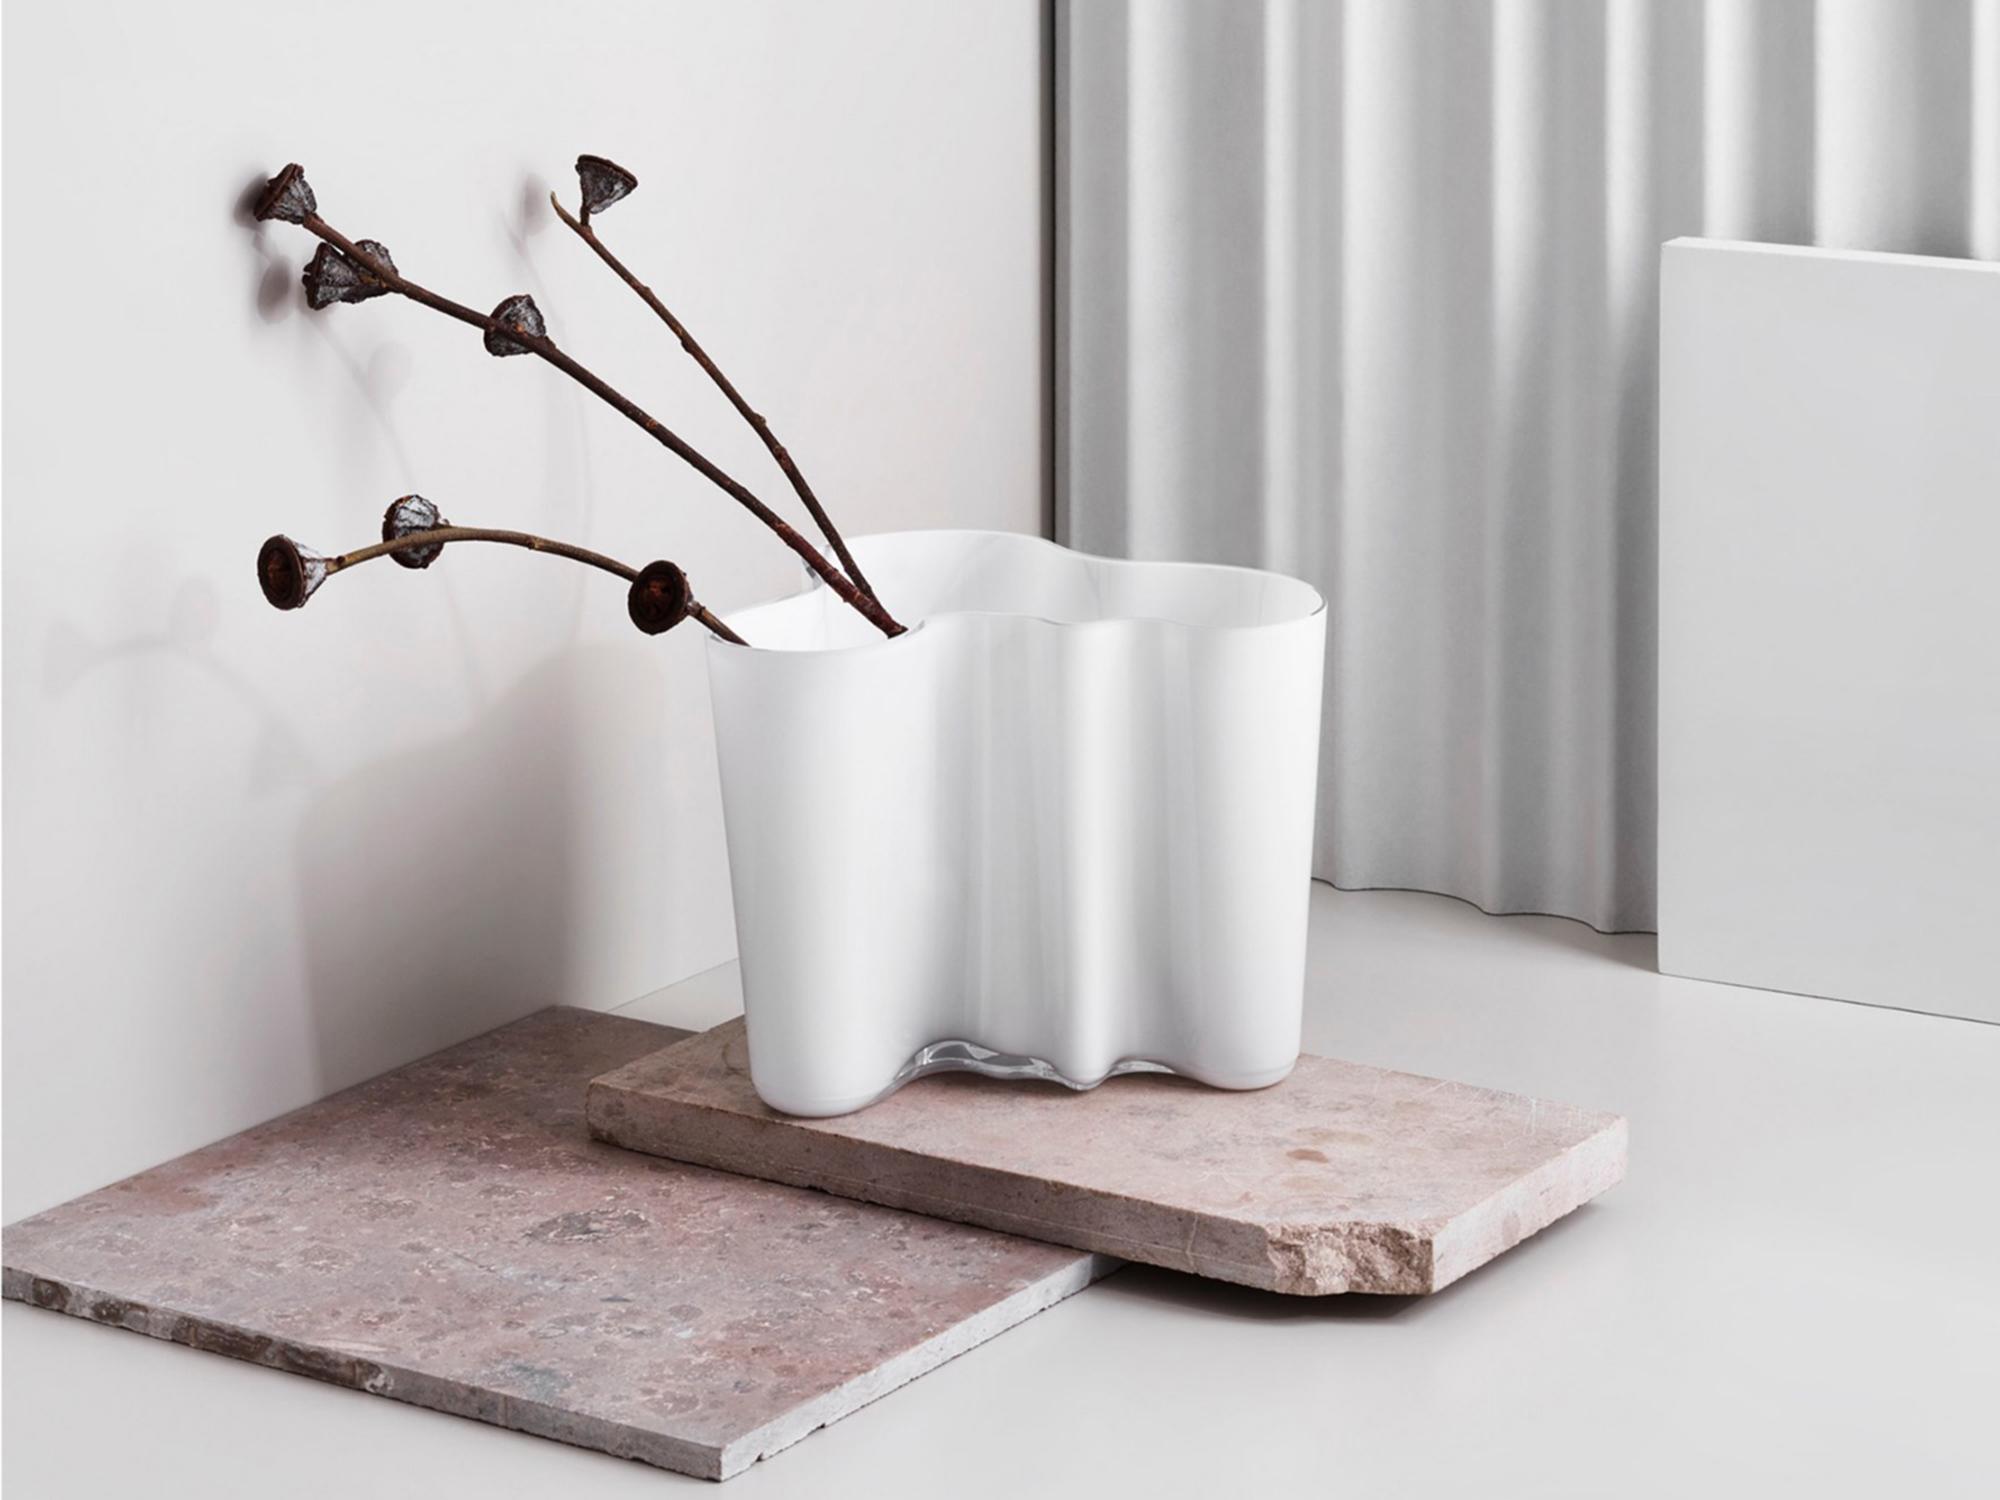 Design Alvar Aalto.Alvar Aalto Vase 95mm White